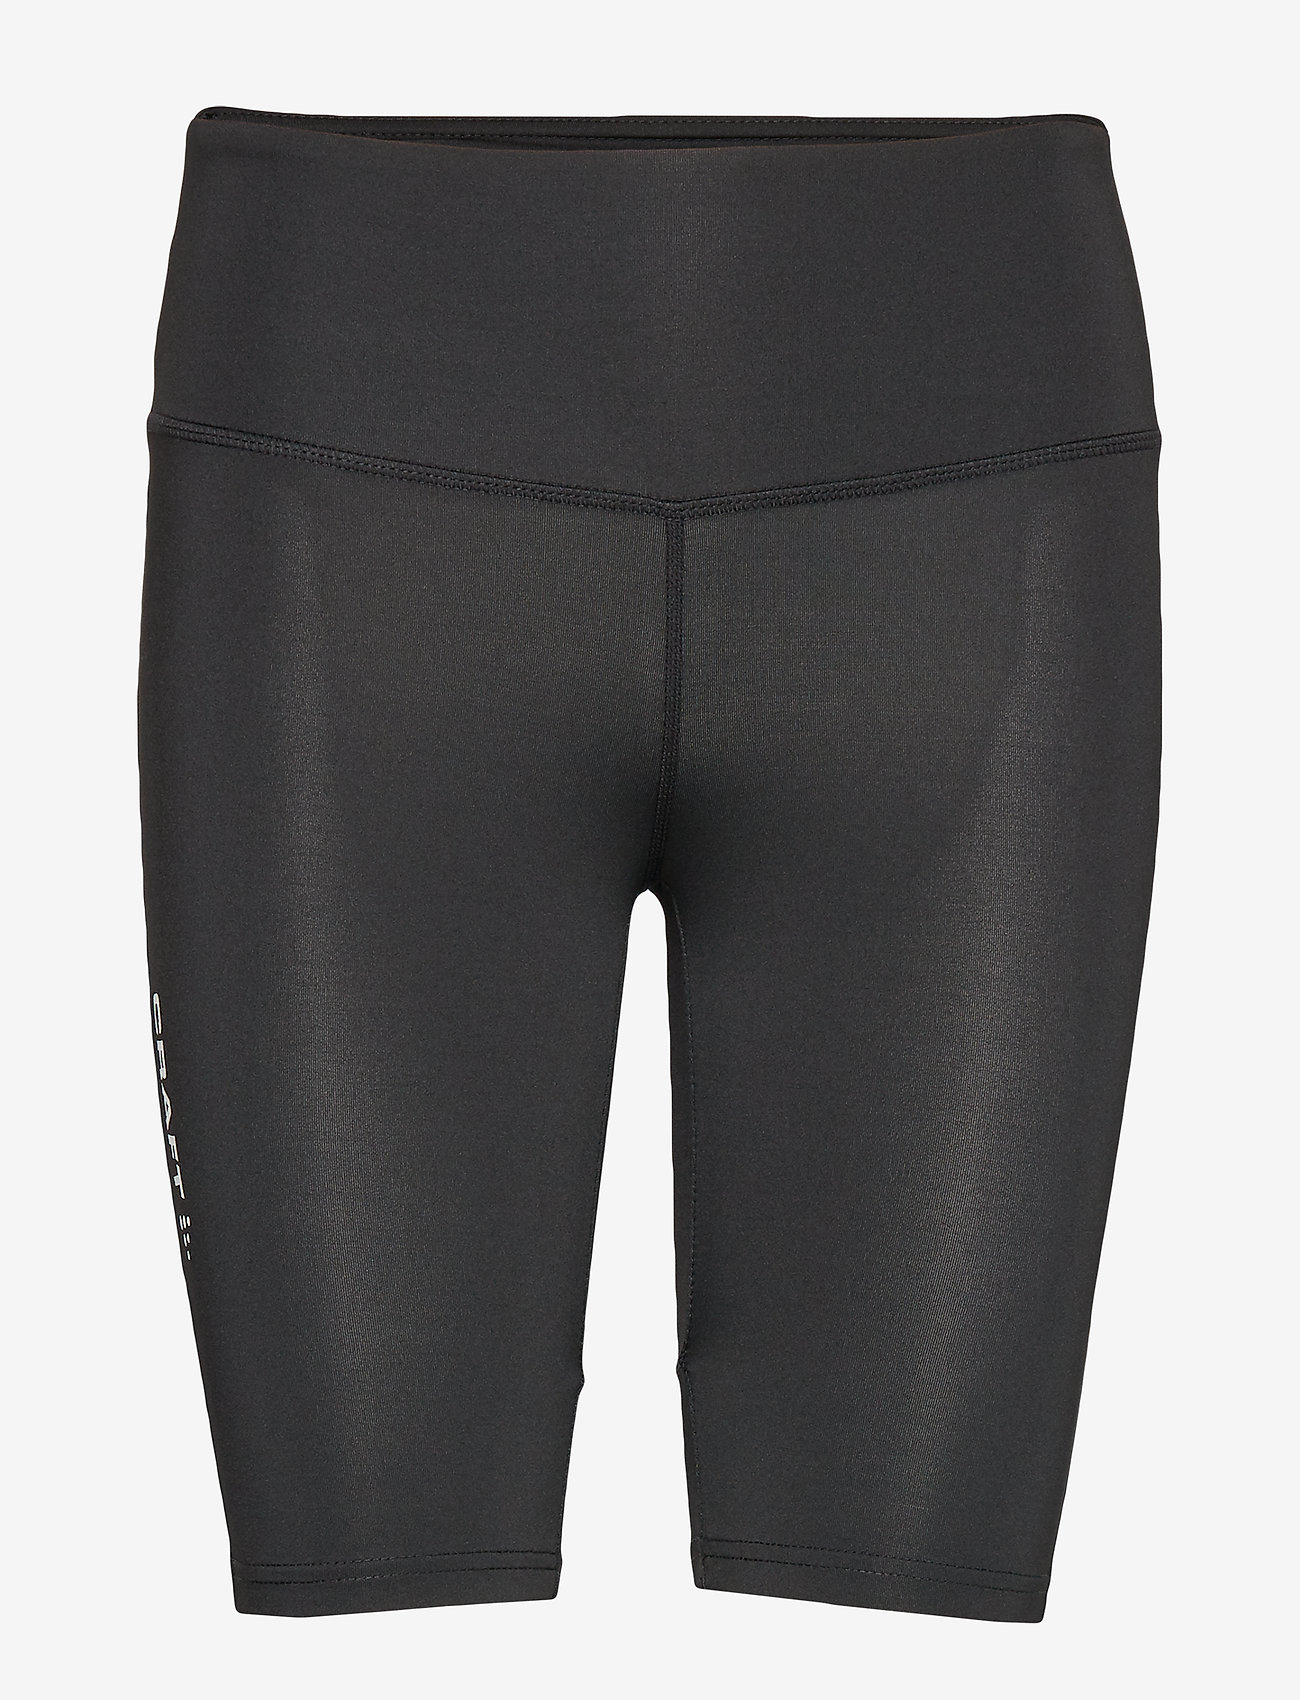 Craft - Rush Short Tights W - träningsshorts - black - 0